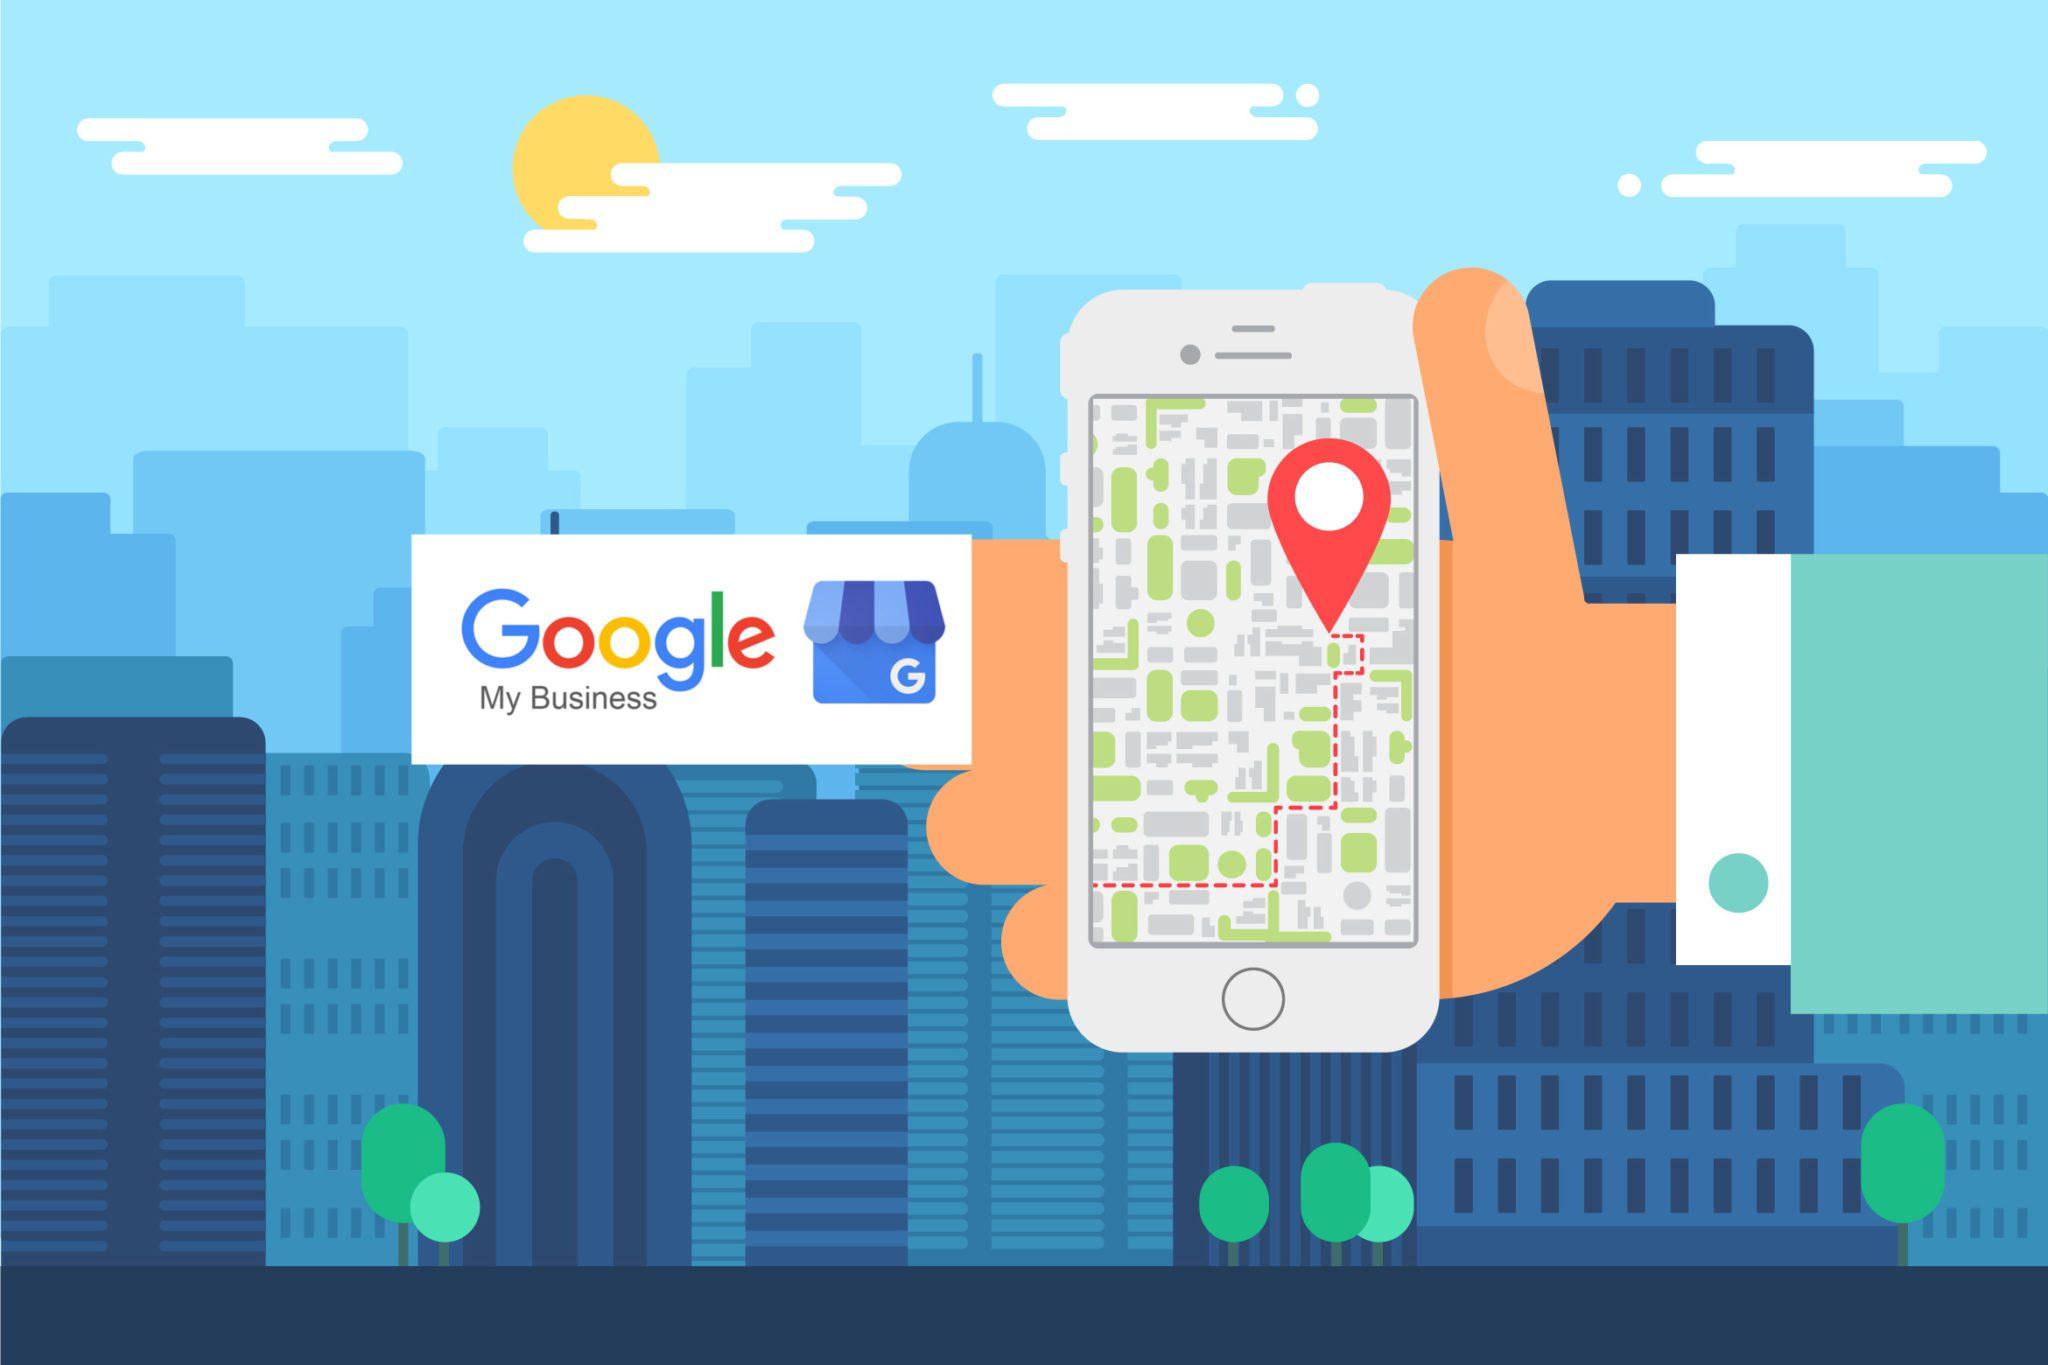 google my business explained